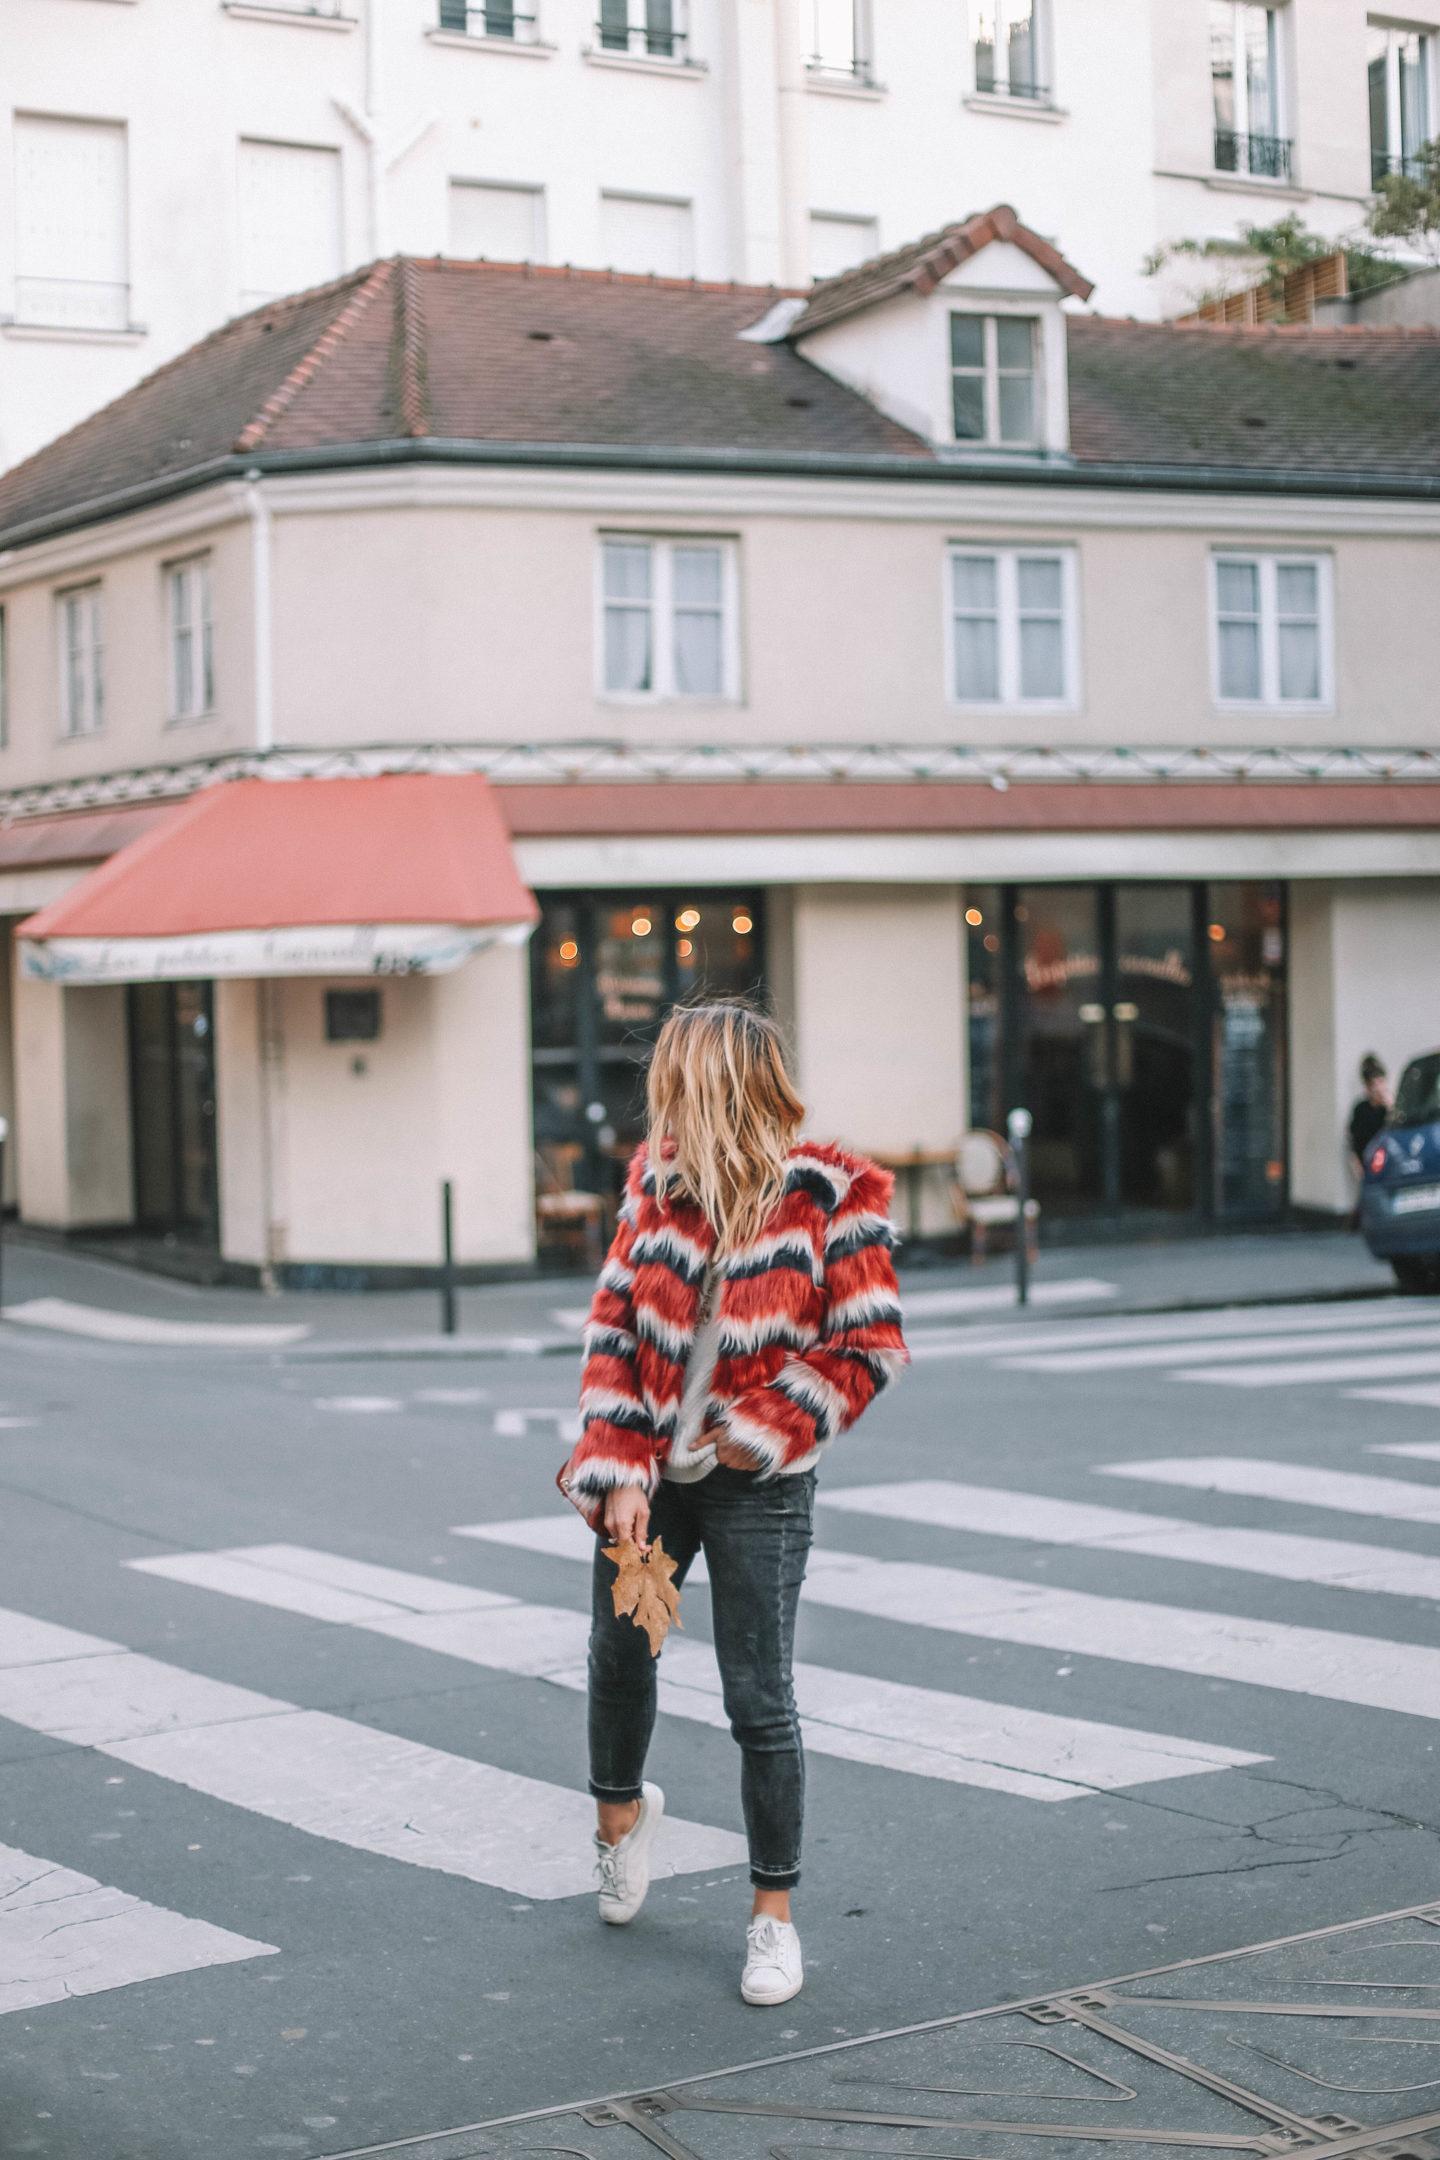 Revolve Clothing - Blondie Baby blog mode et voyages